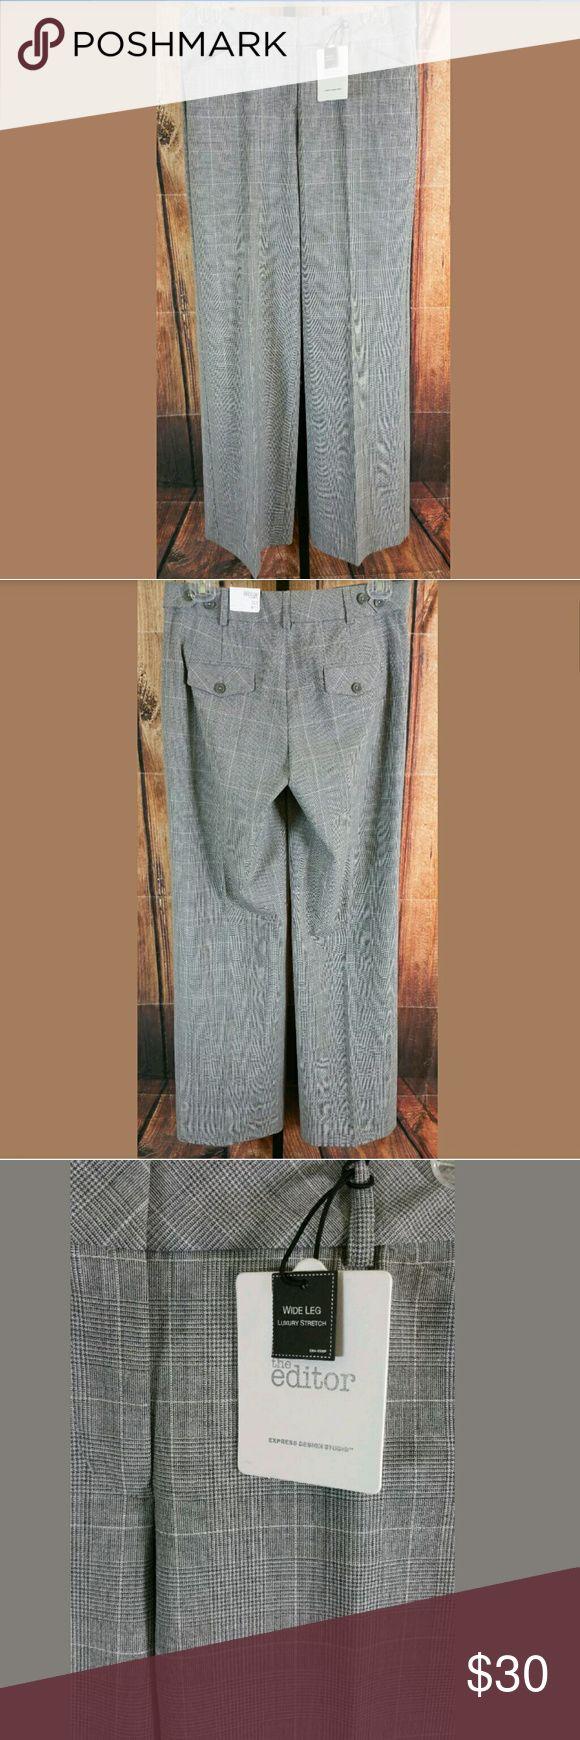 Long dress pants 28